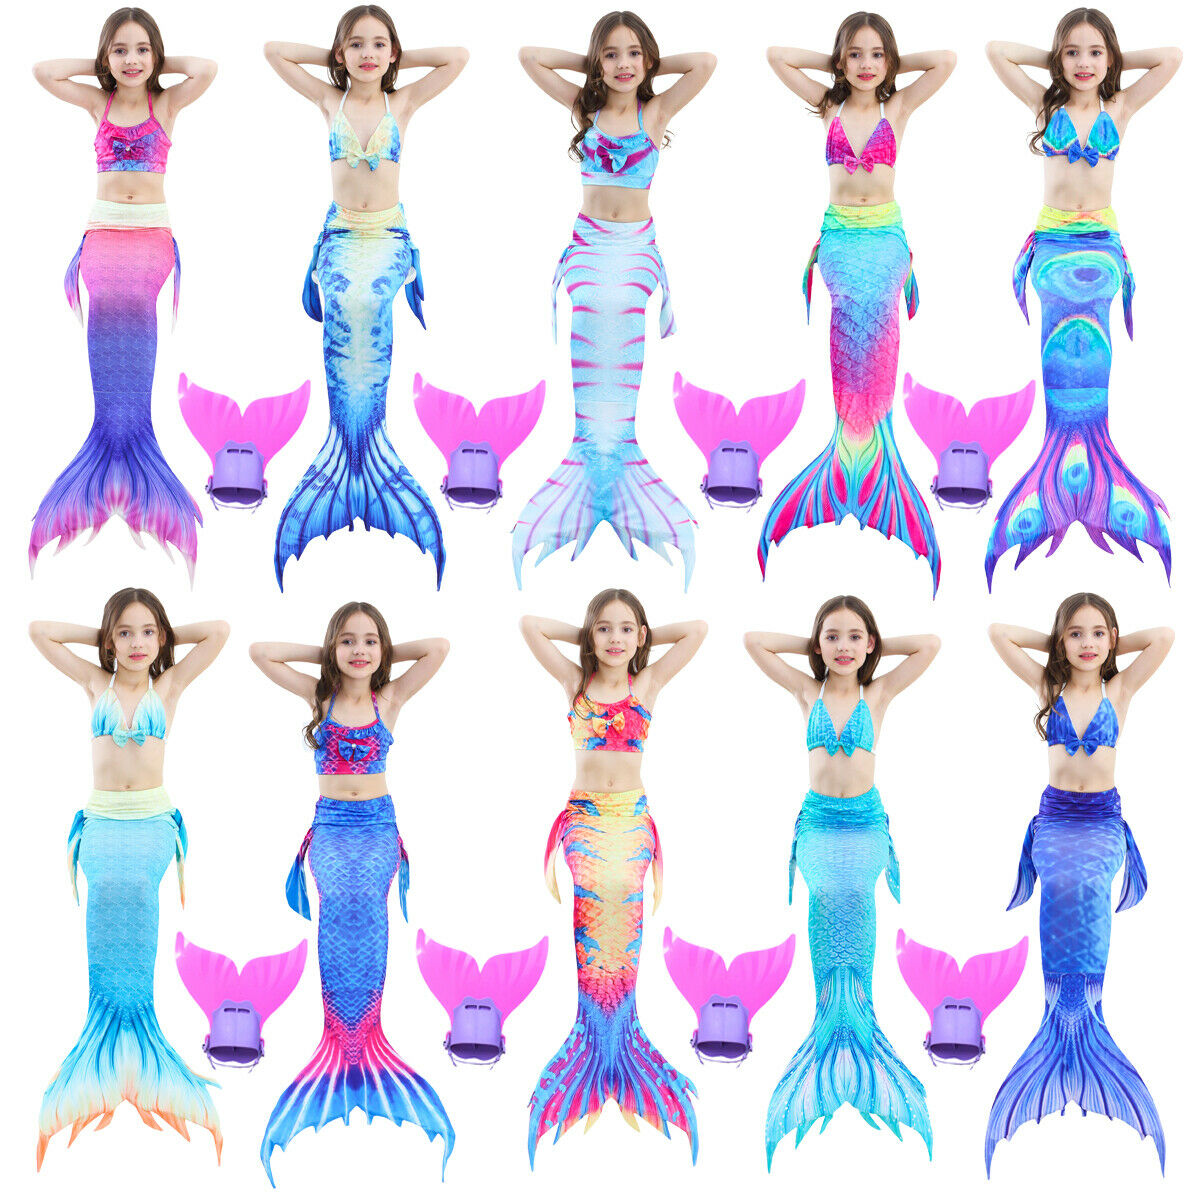 3/4er Kinder Mädchen Schwanzflosse Bikini Badeanzug Bademode Meerjungfrau Kostüm